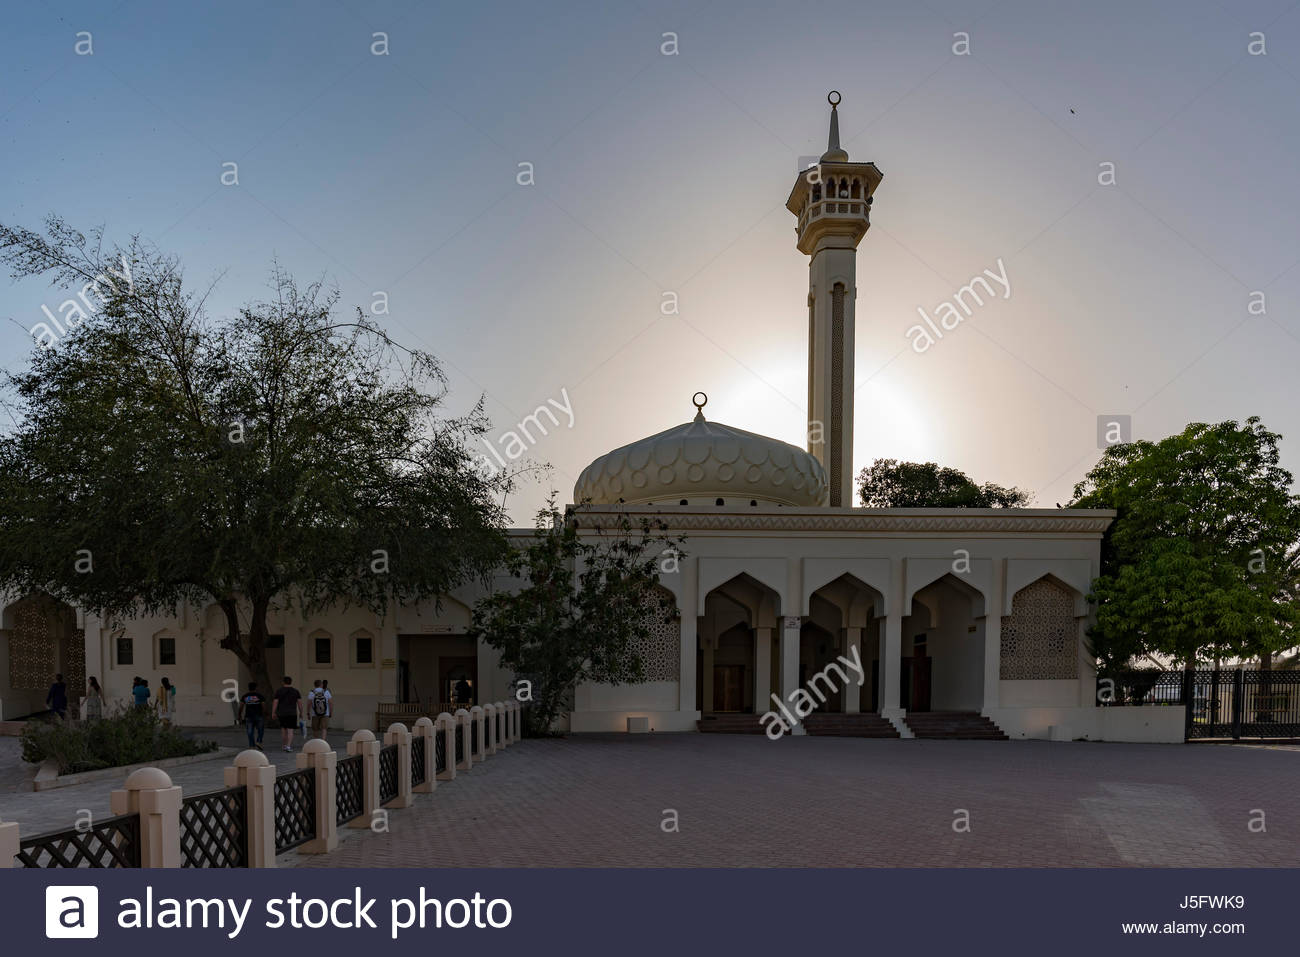 Mosque Al Fahidi Historical Neighborhood - construction started back to the 1890s -(known as Al Bastakiya Quarter), - Stock Image